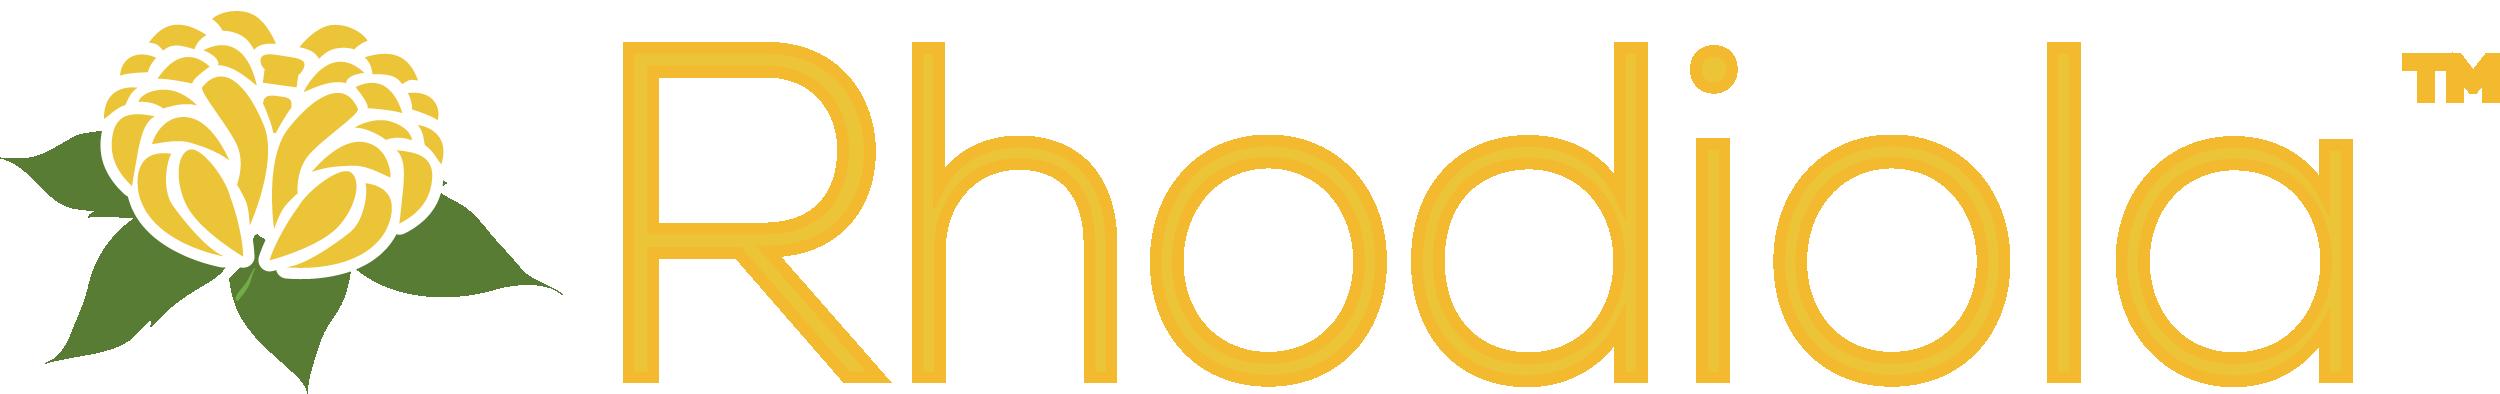 Rhodiola Logo.png